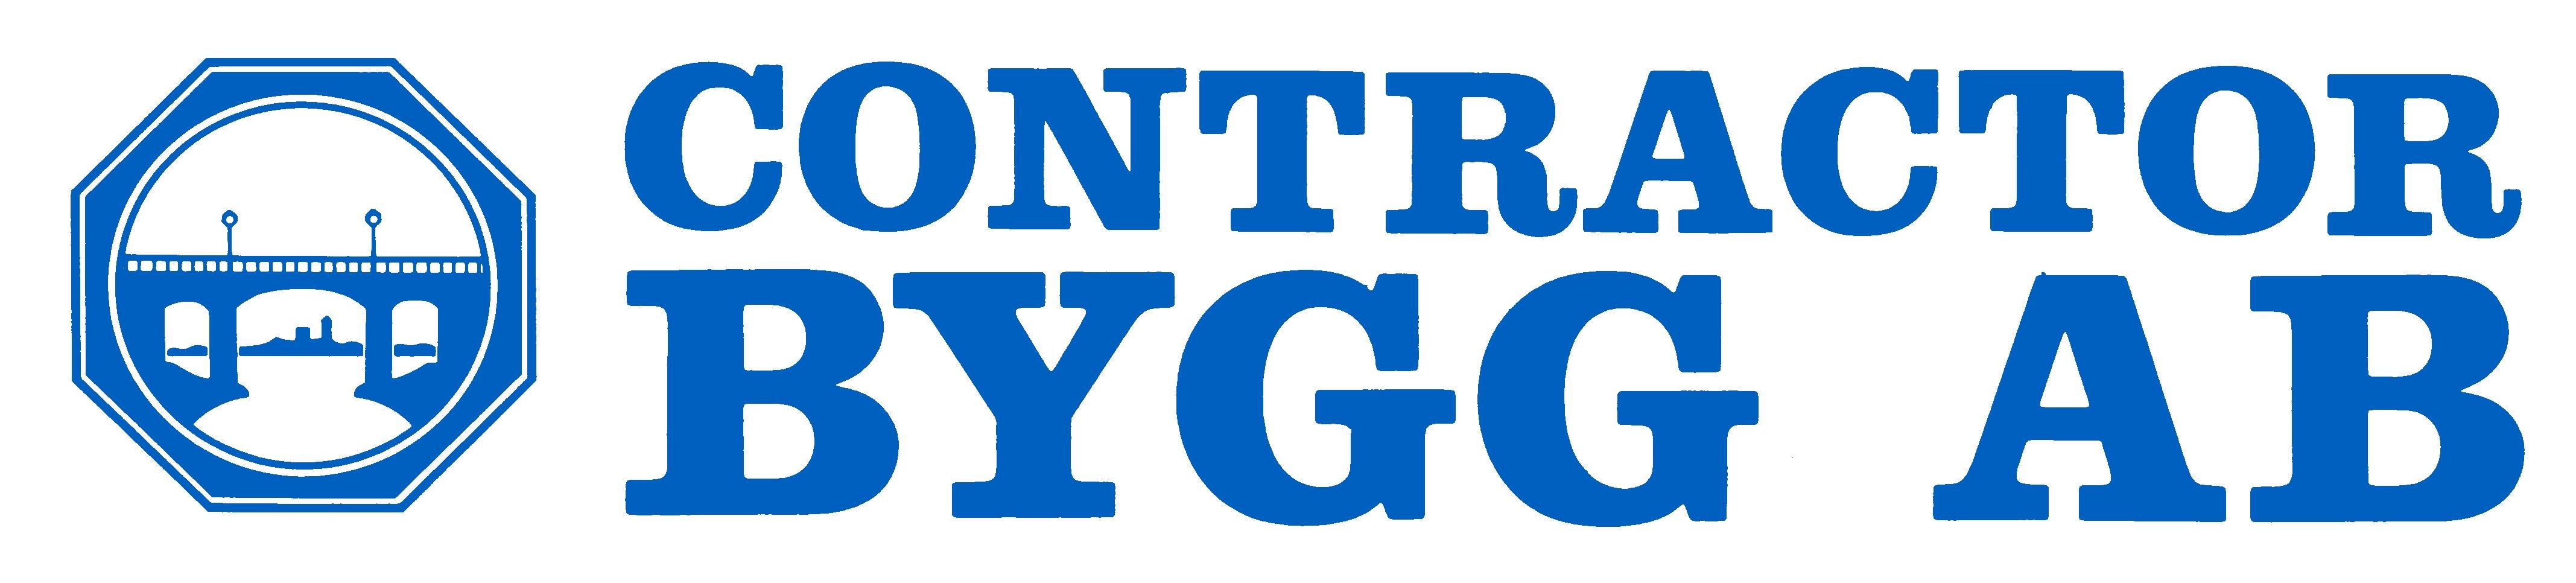 Contractor Bygg